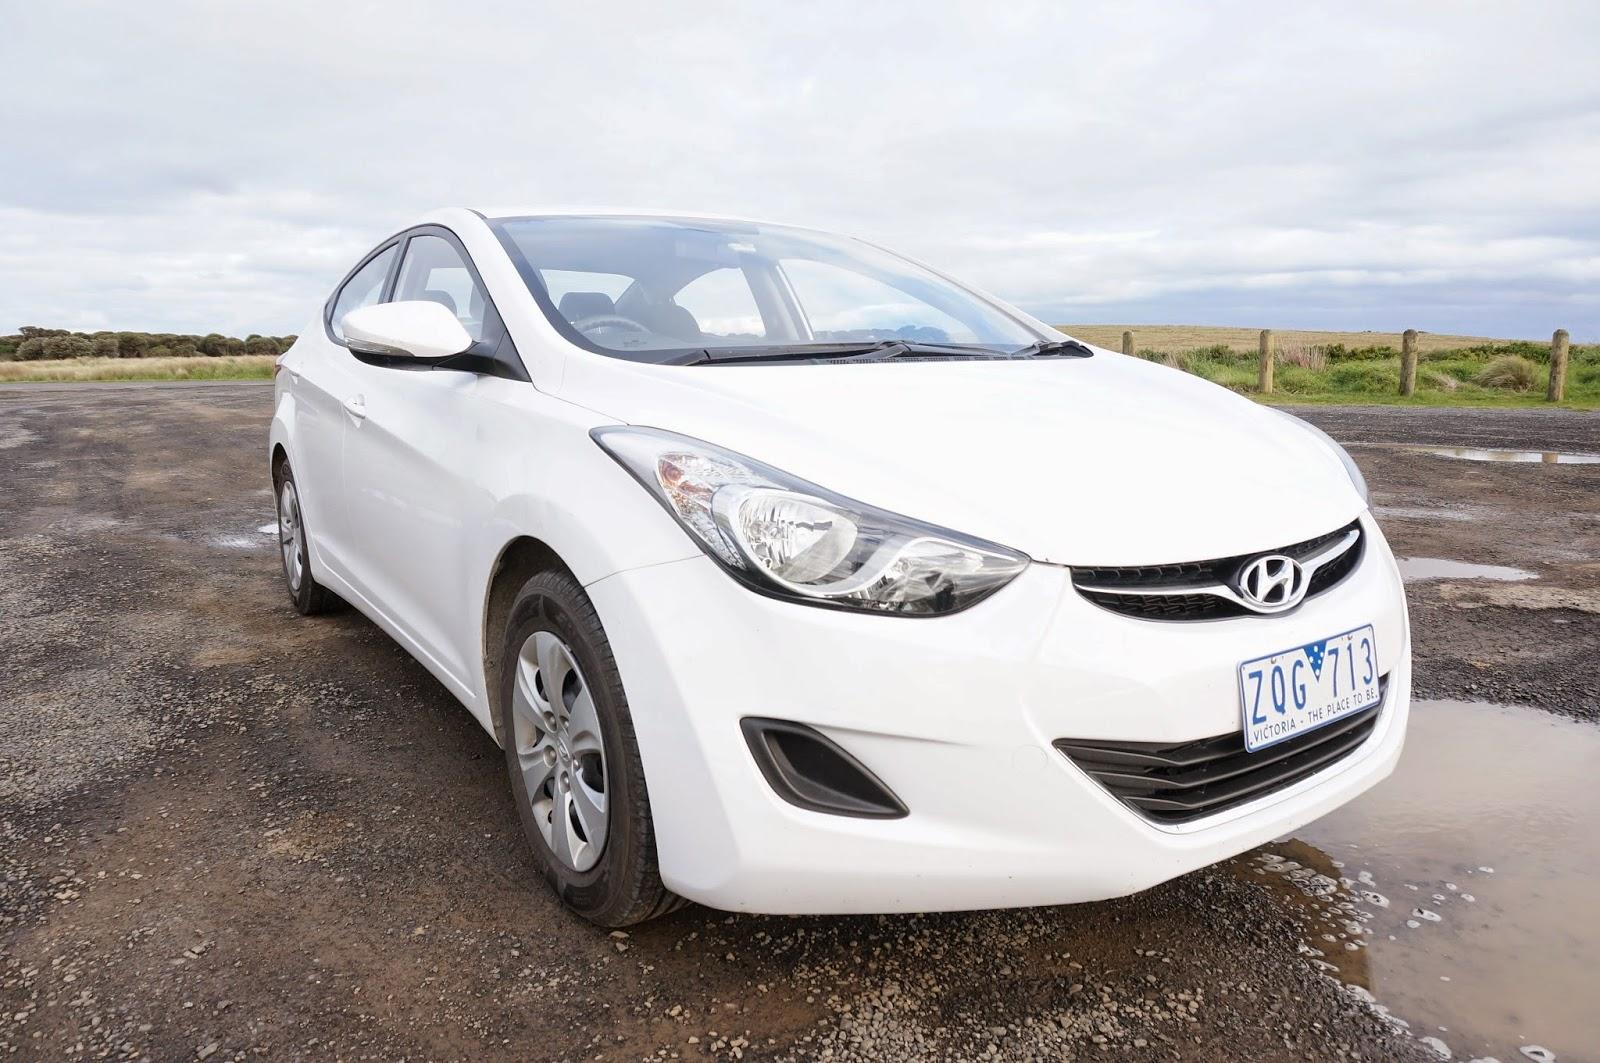 Apex Rental Car Melbourne